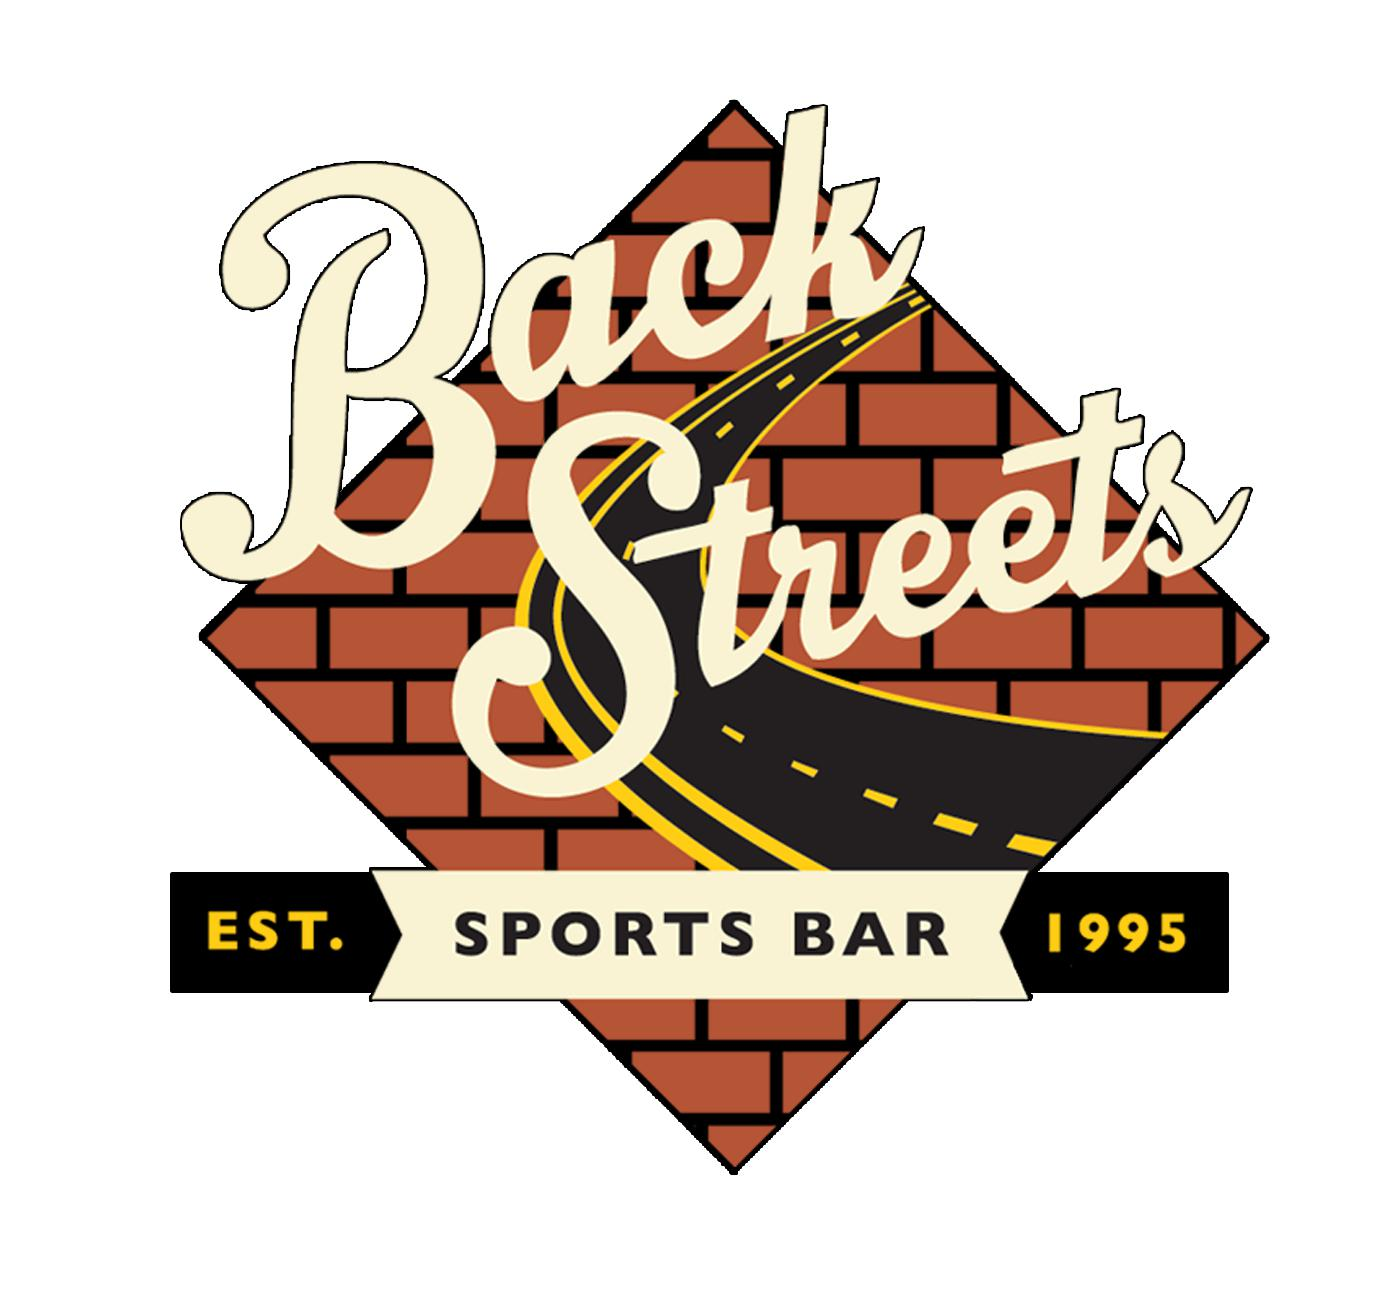 BackStreets Sports Bar 915 SE 47th Ter, Cape Coral, FL